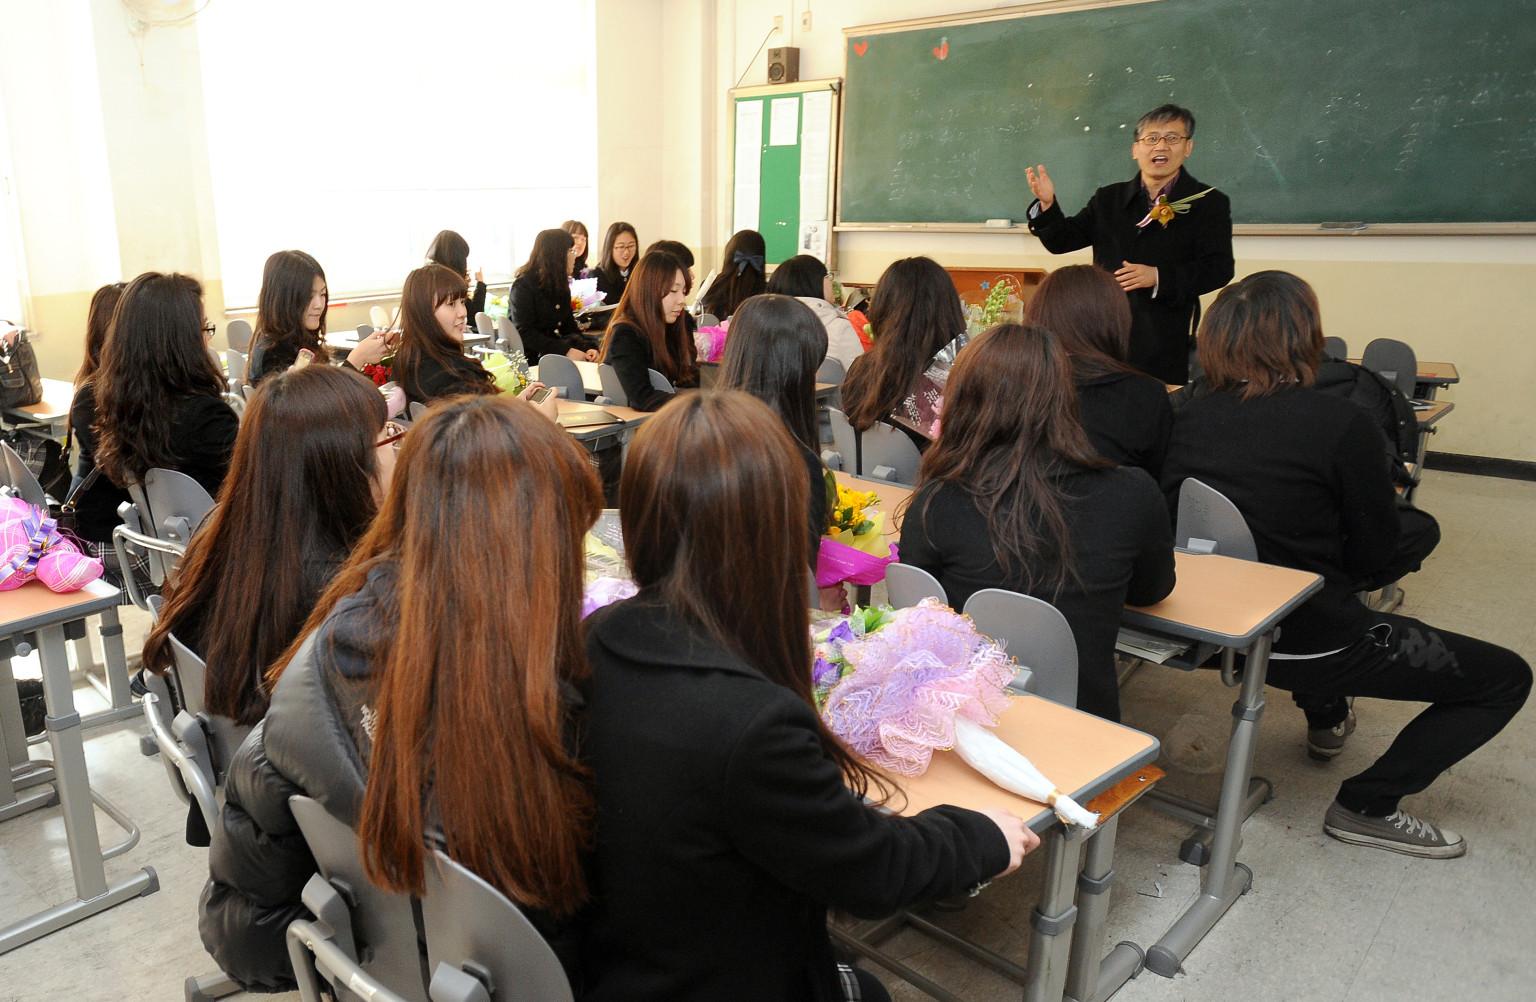 Kim Ki-hoon, South Korean Teacher, Makes $4 Million A Year ...